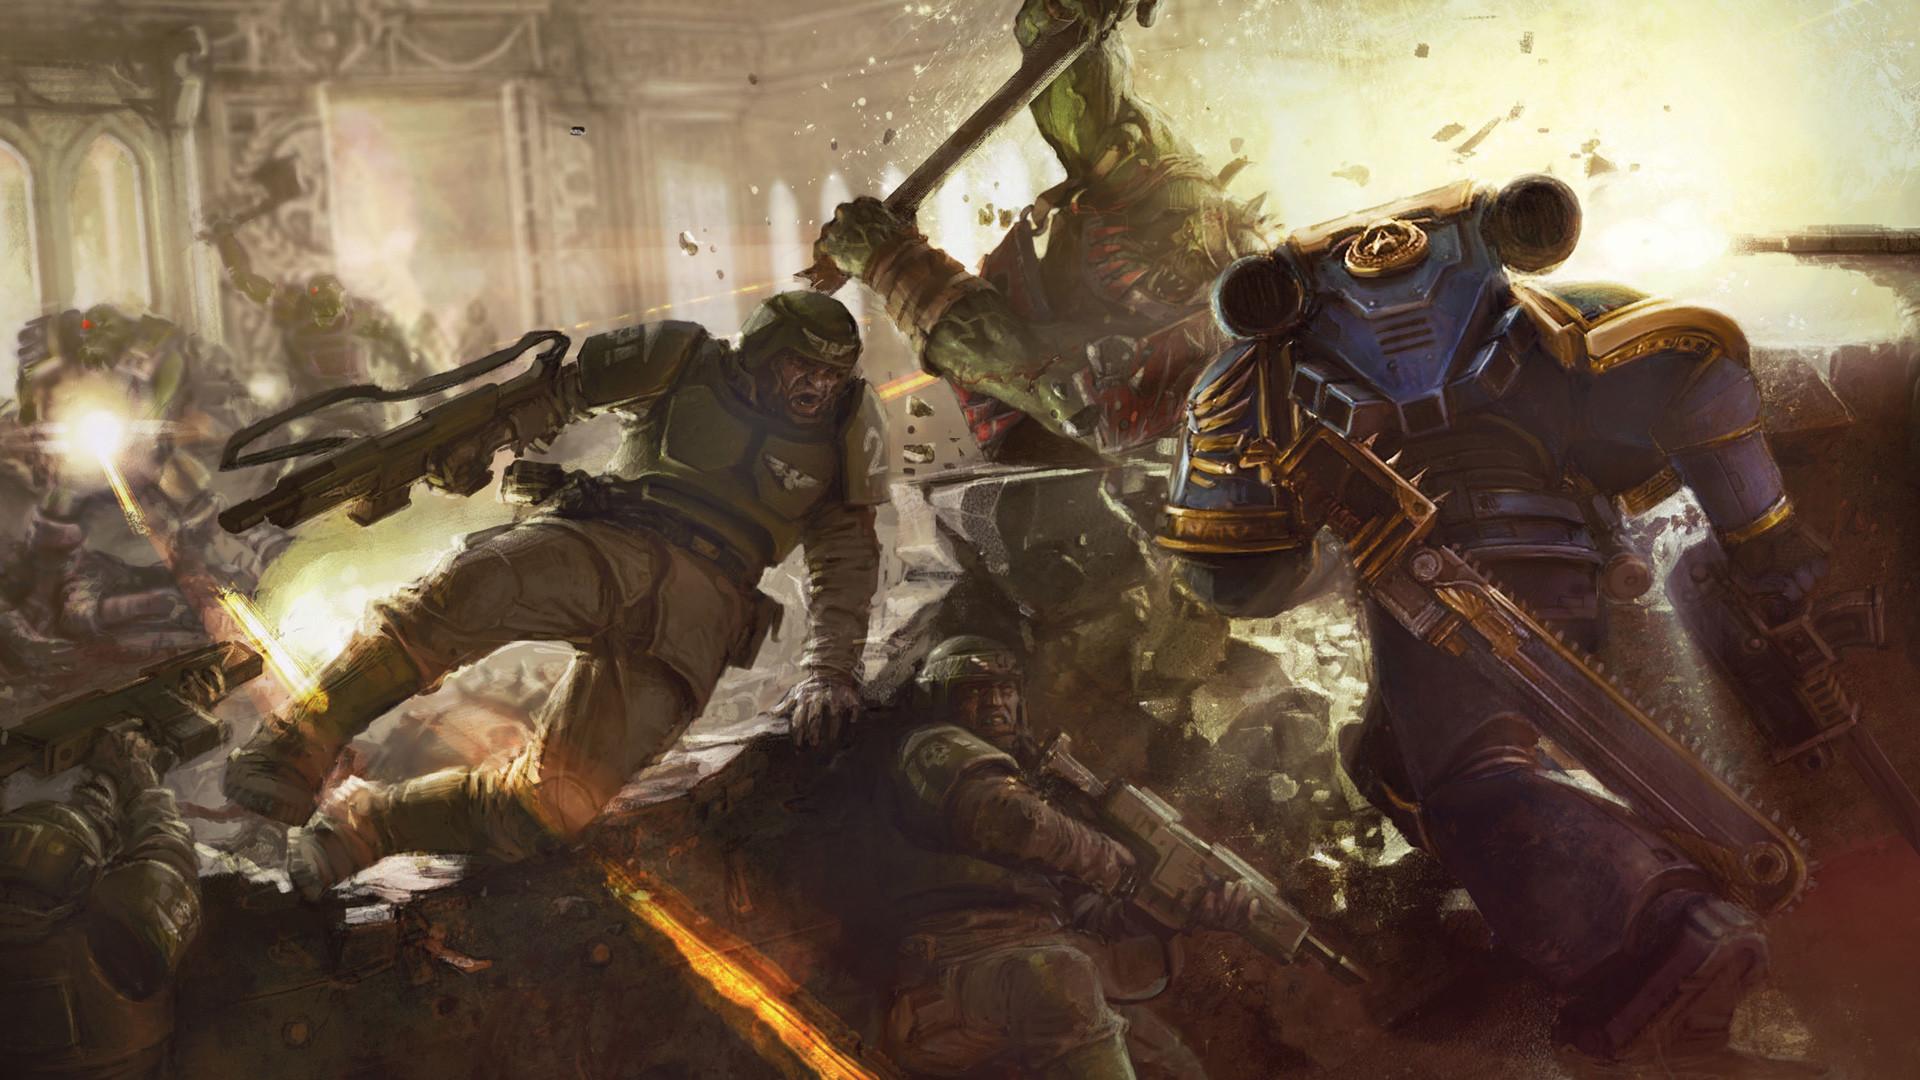 Warhammer 40K Res: HD / Size:605kb. Views: 3471